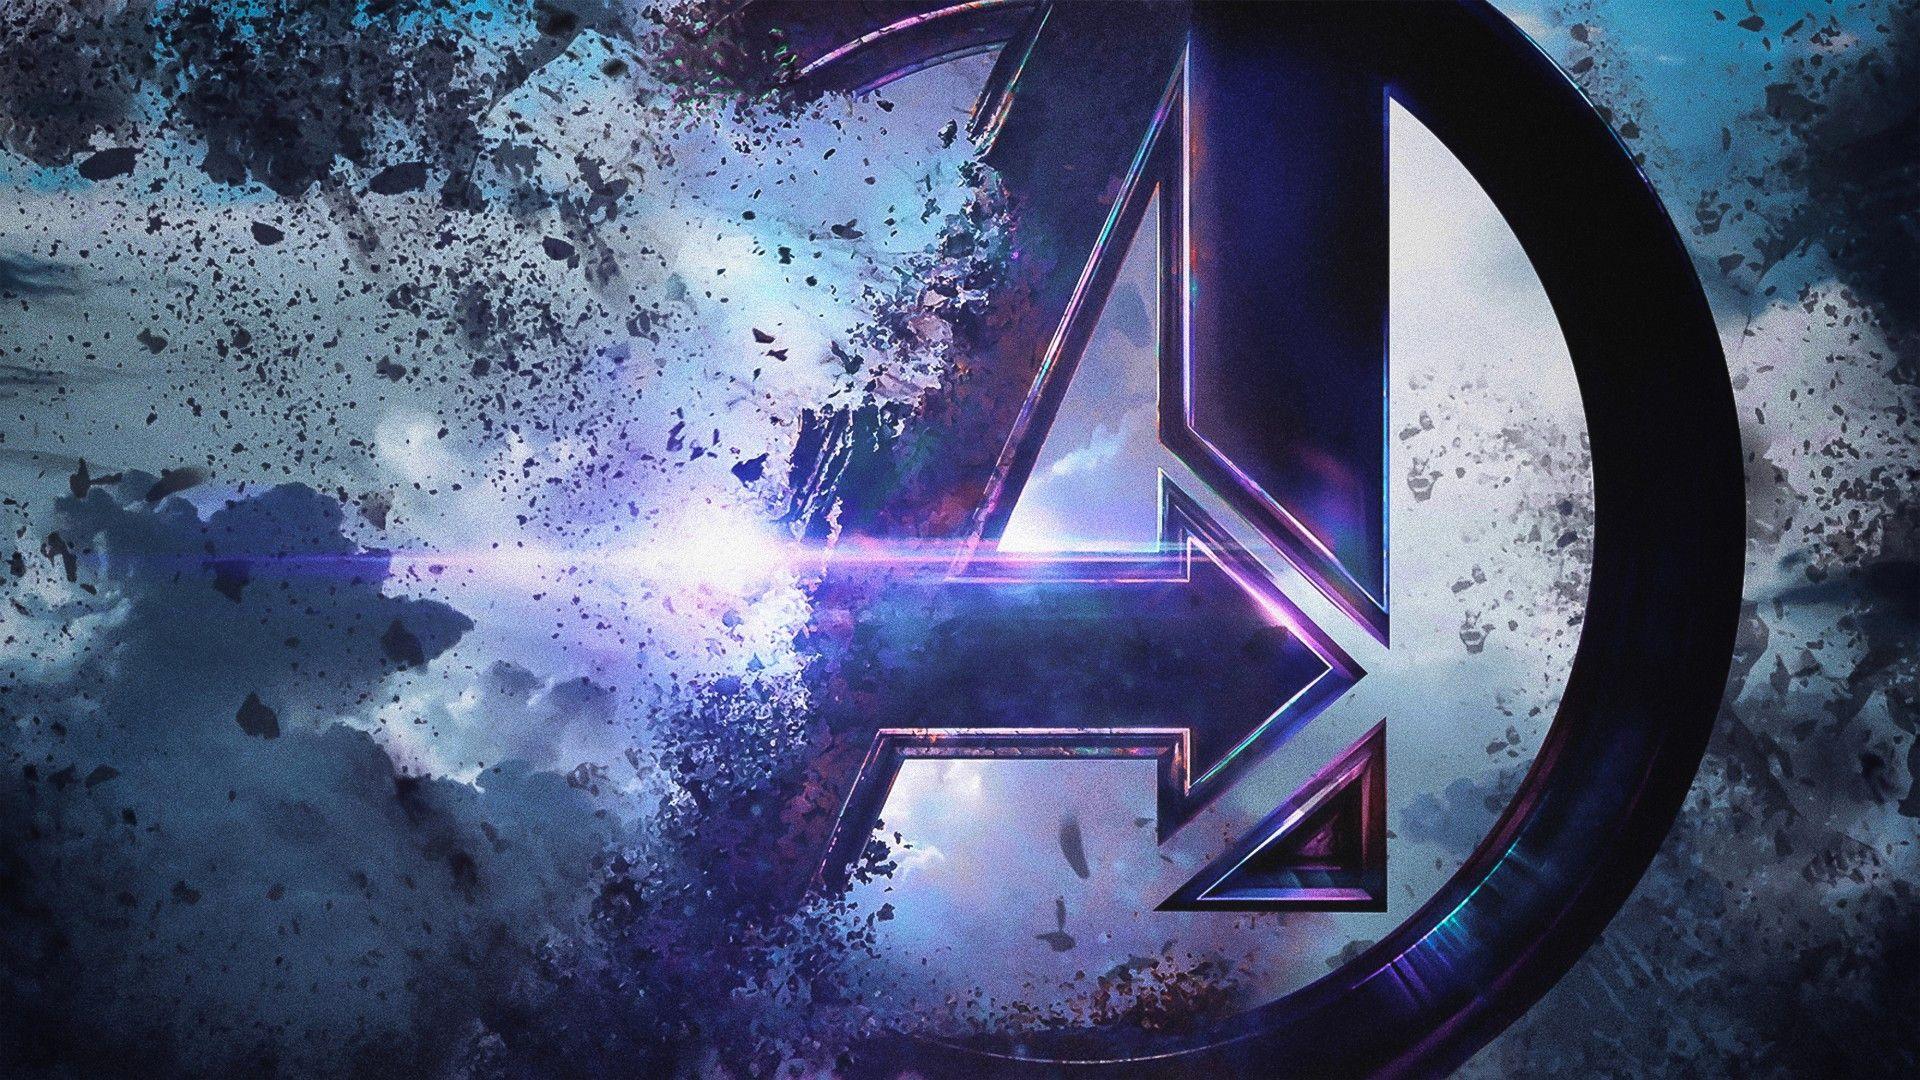 Awesome Avengers Endgame Logo Wallpaper Wallpaper Stream Avengers Wallpaper Marvel Wallpaper Iron Man Hd Wallpaper